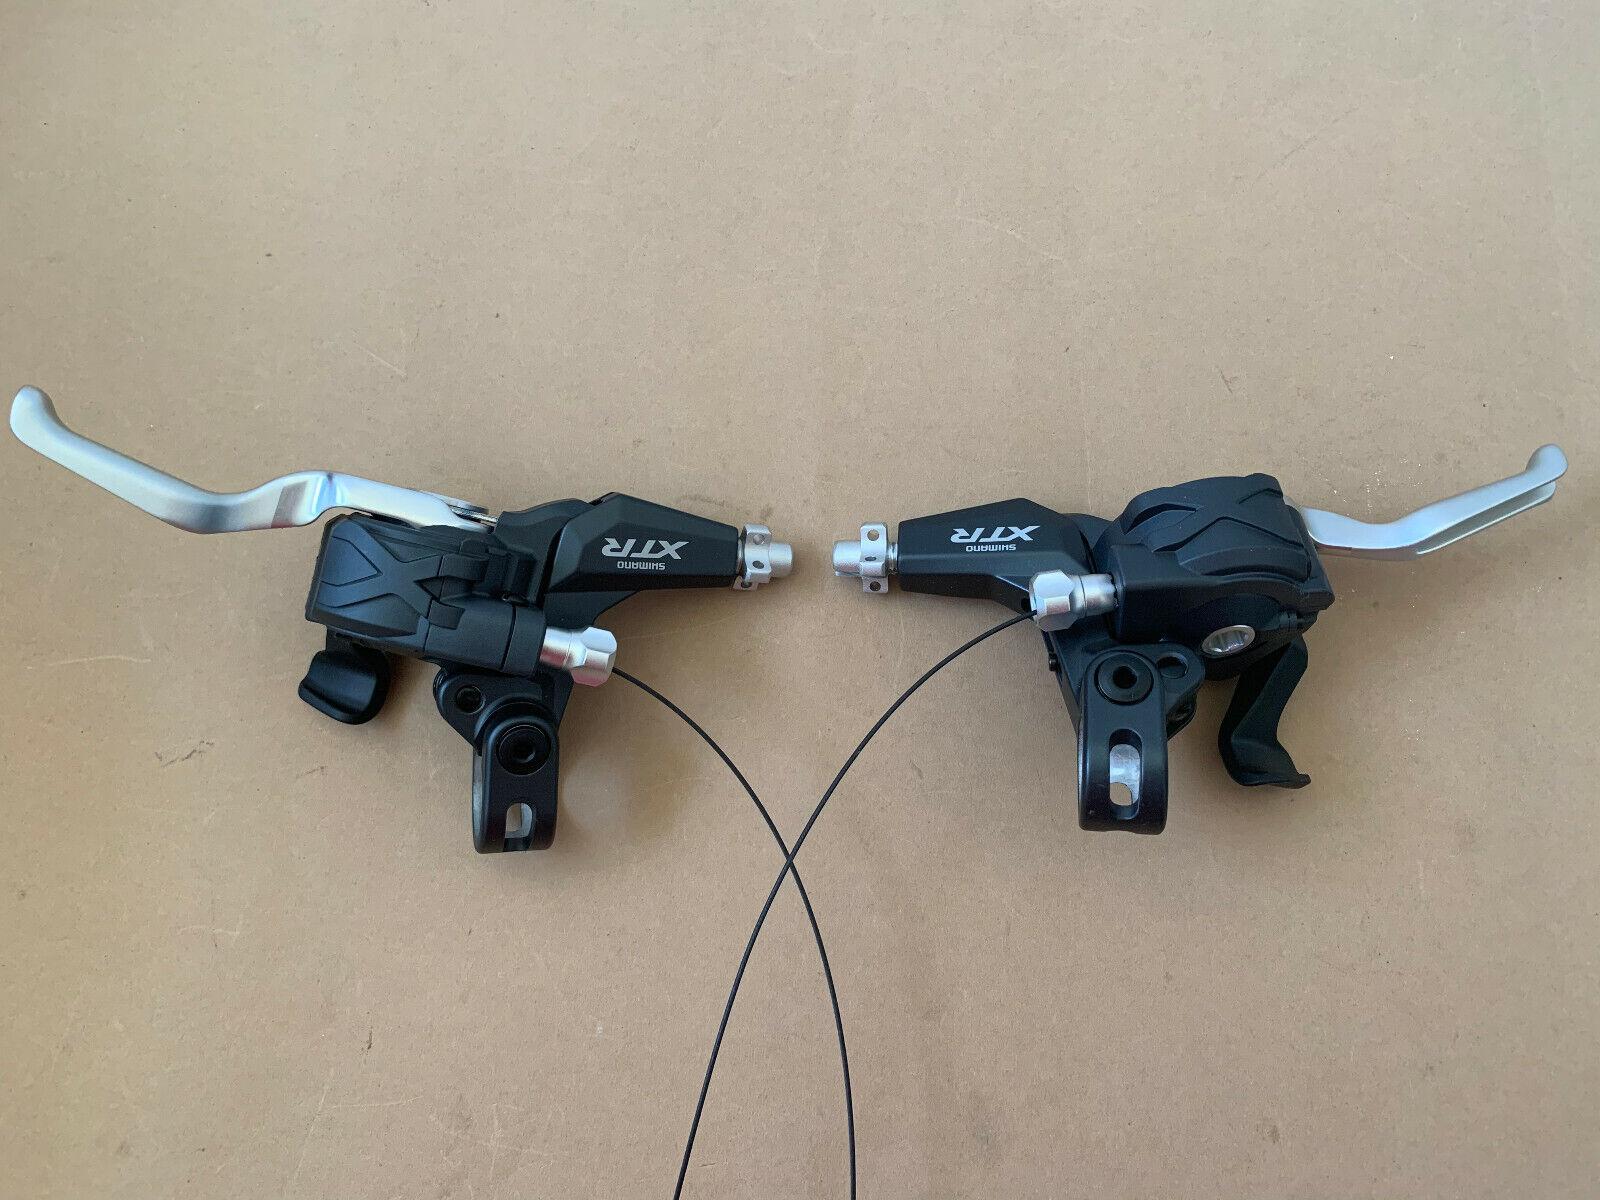 Shimano XTR ST-M970 3x9 TRIPLE links rechts switcHGEAR BRAKE LEVER NEU